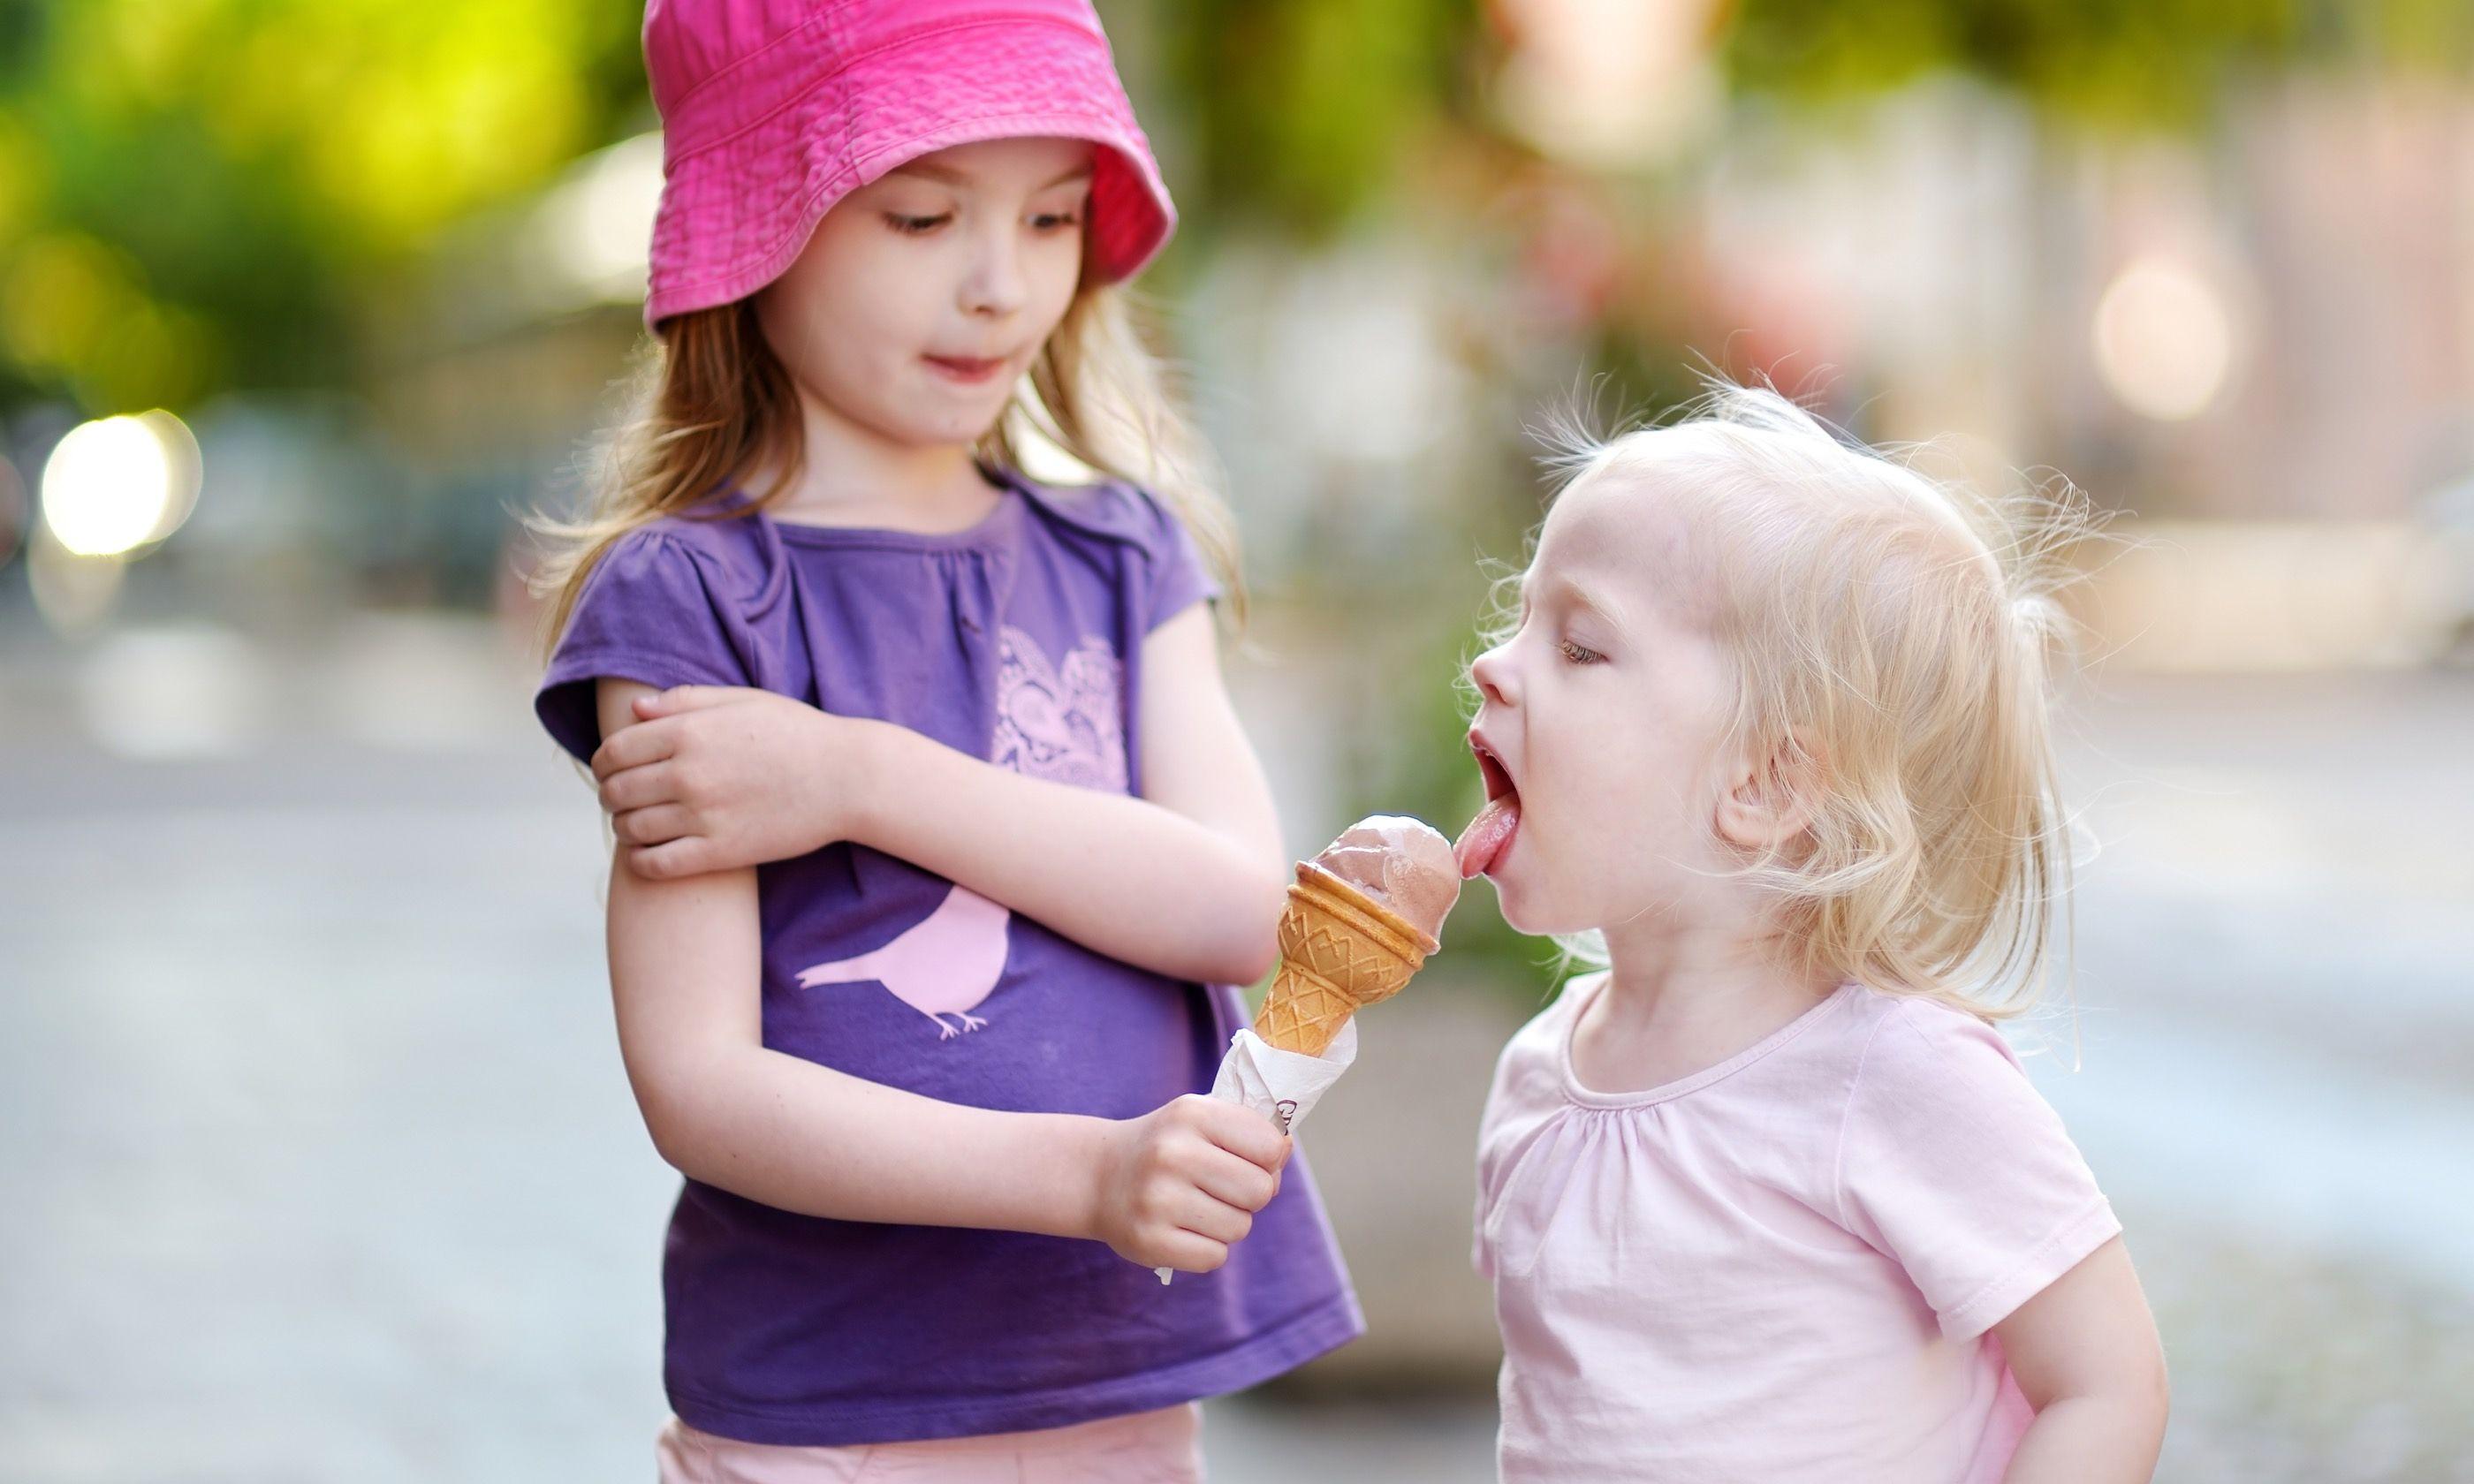 Sisters eating ice cream (Dreamstime)